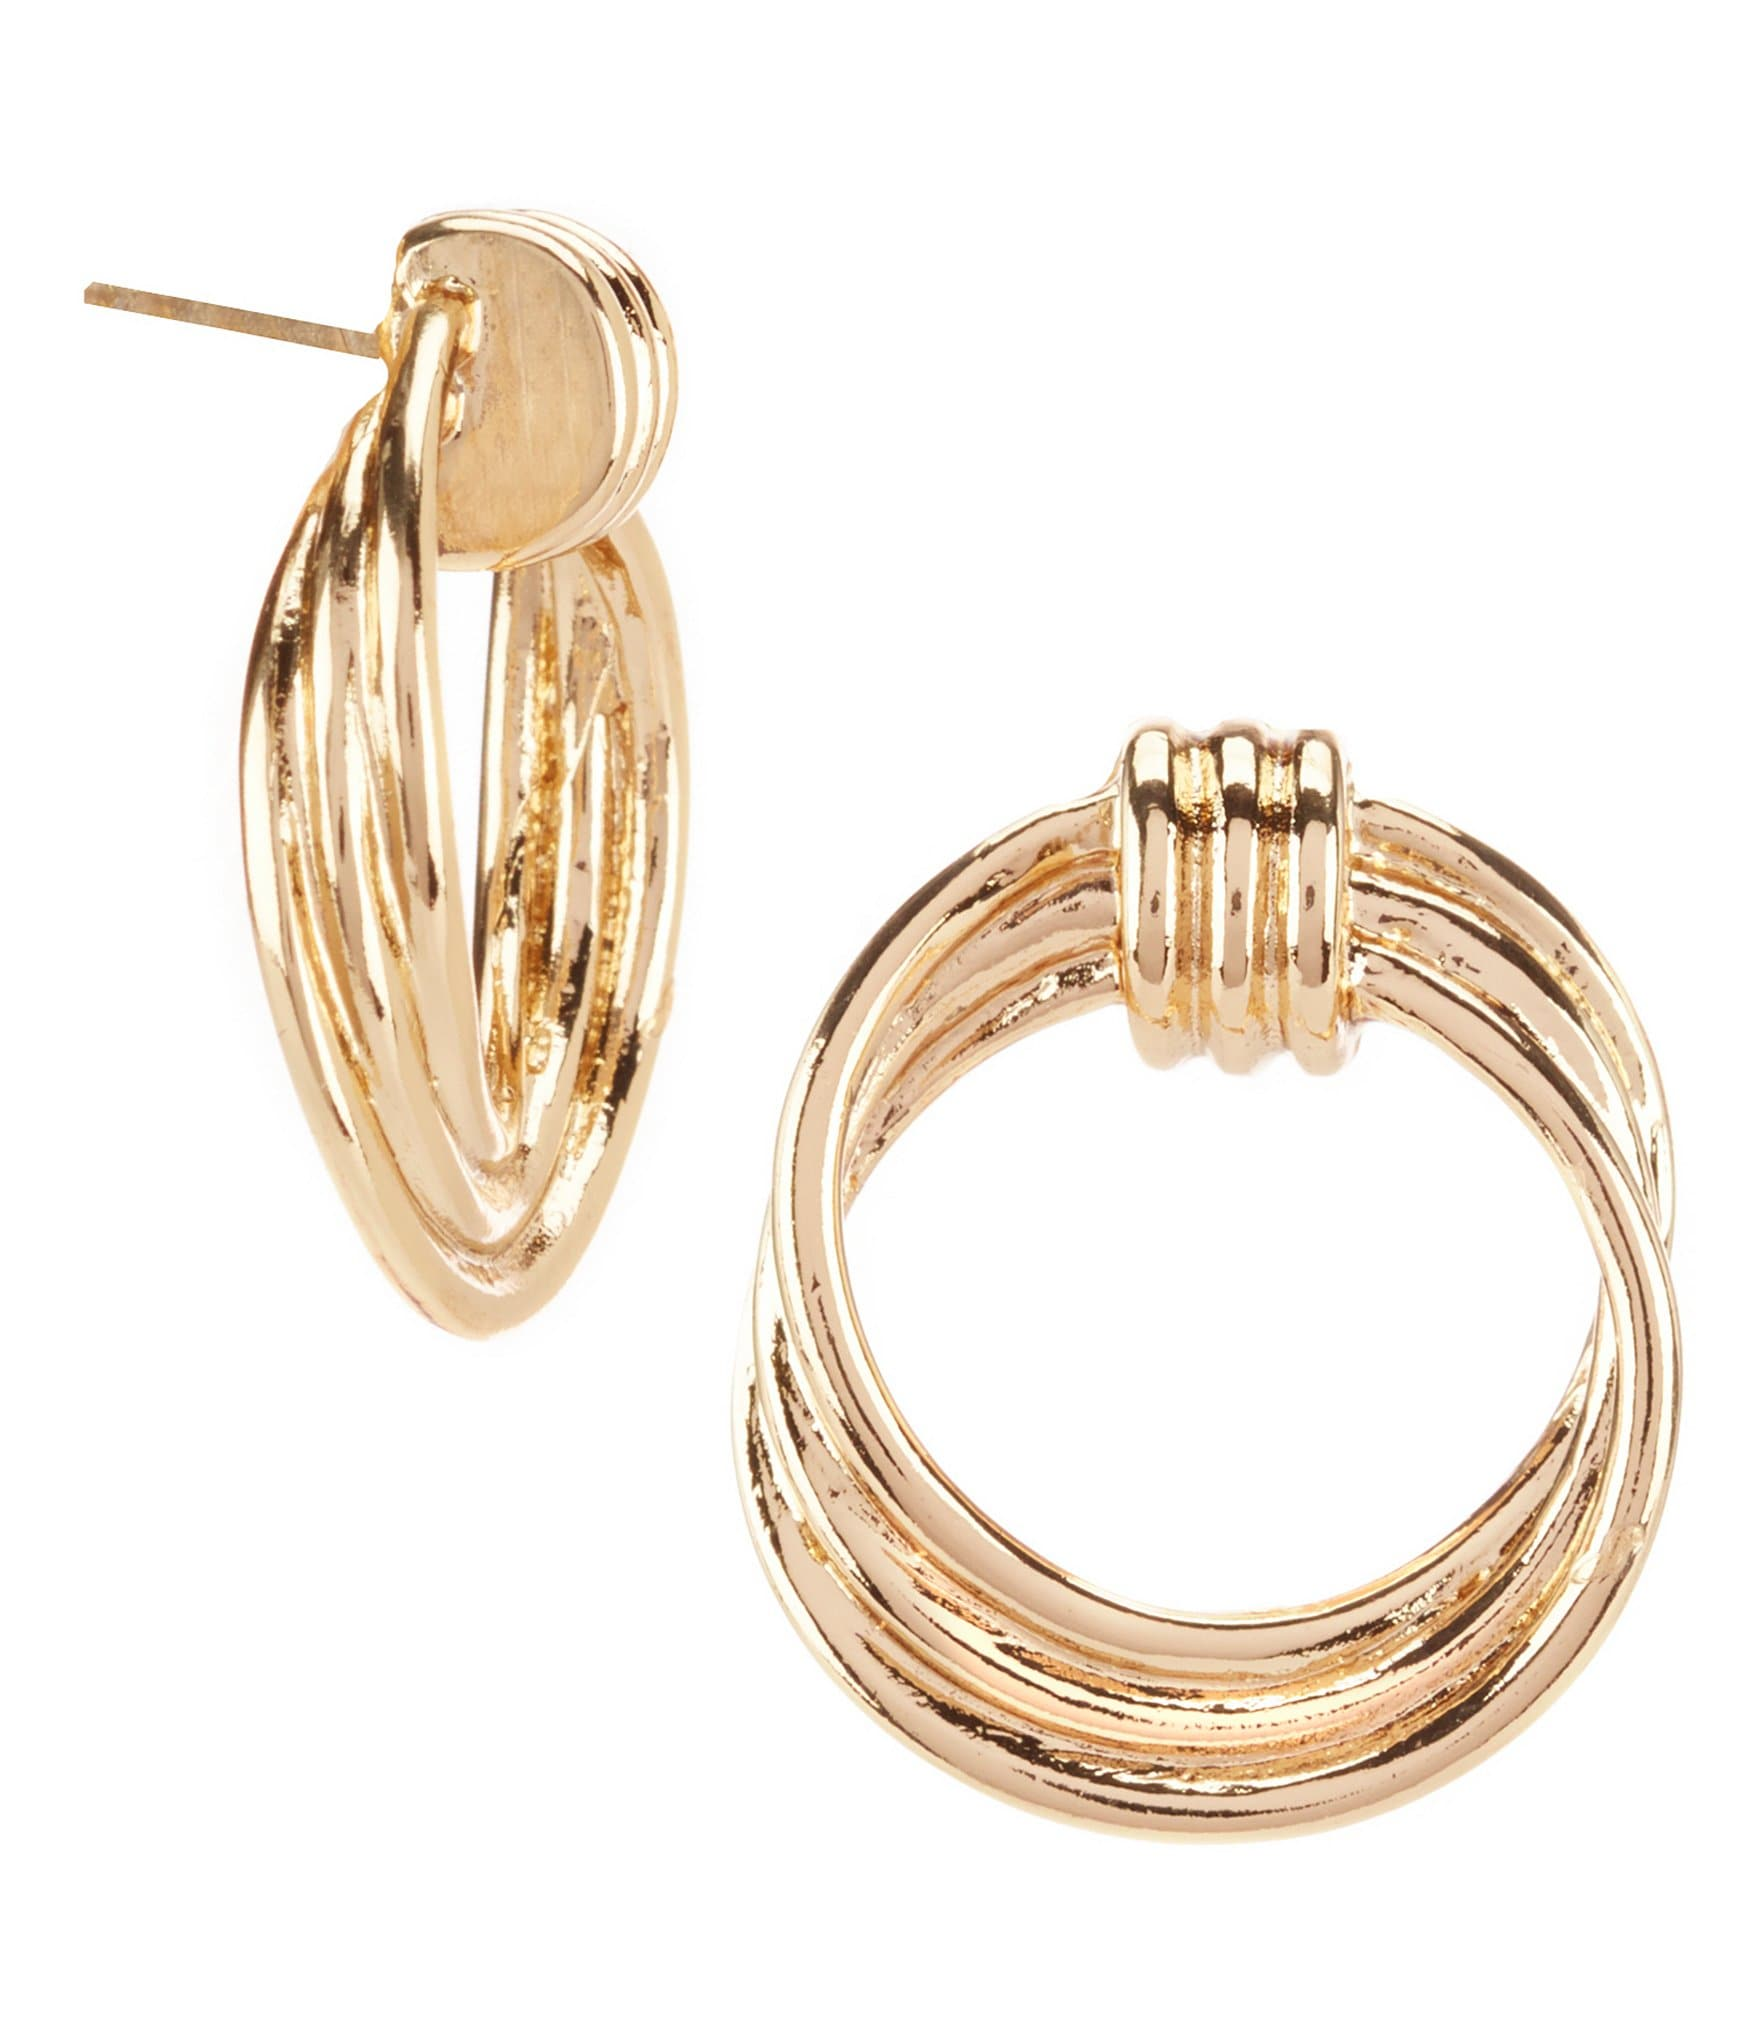 Dillards earrings : Dillard?s tailored rib ring doorknocker hoop earrings